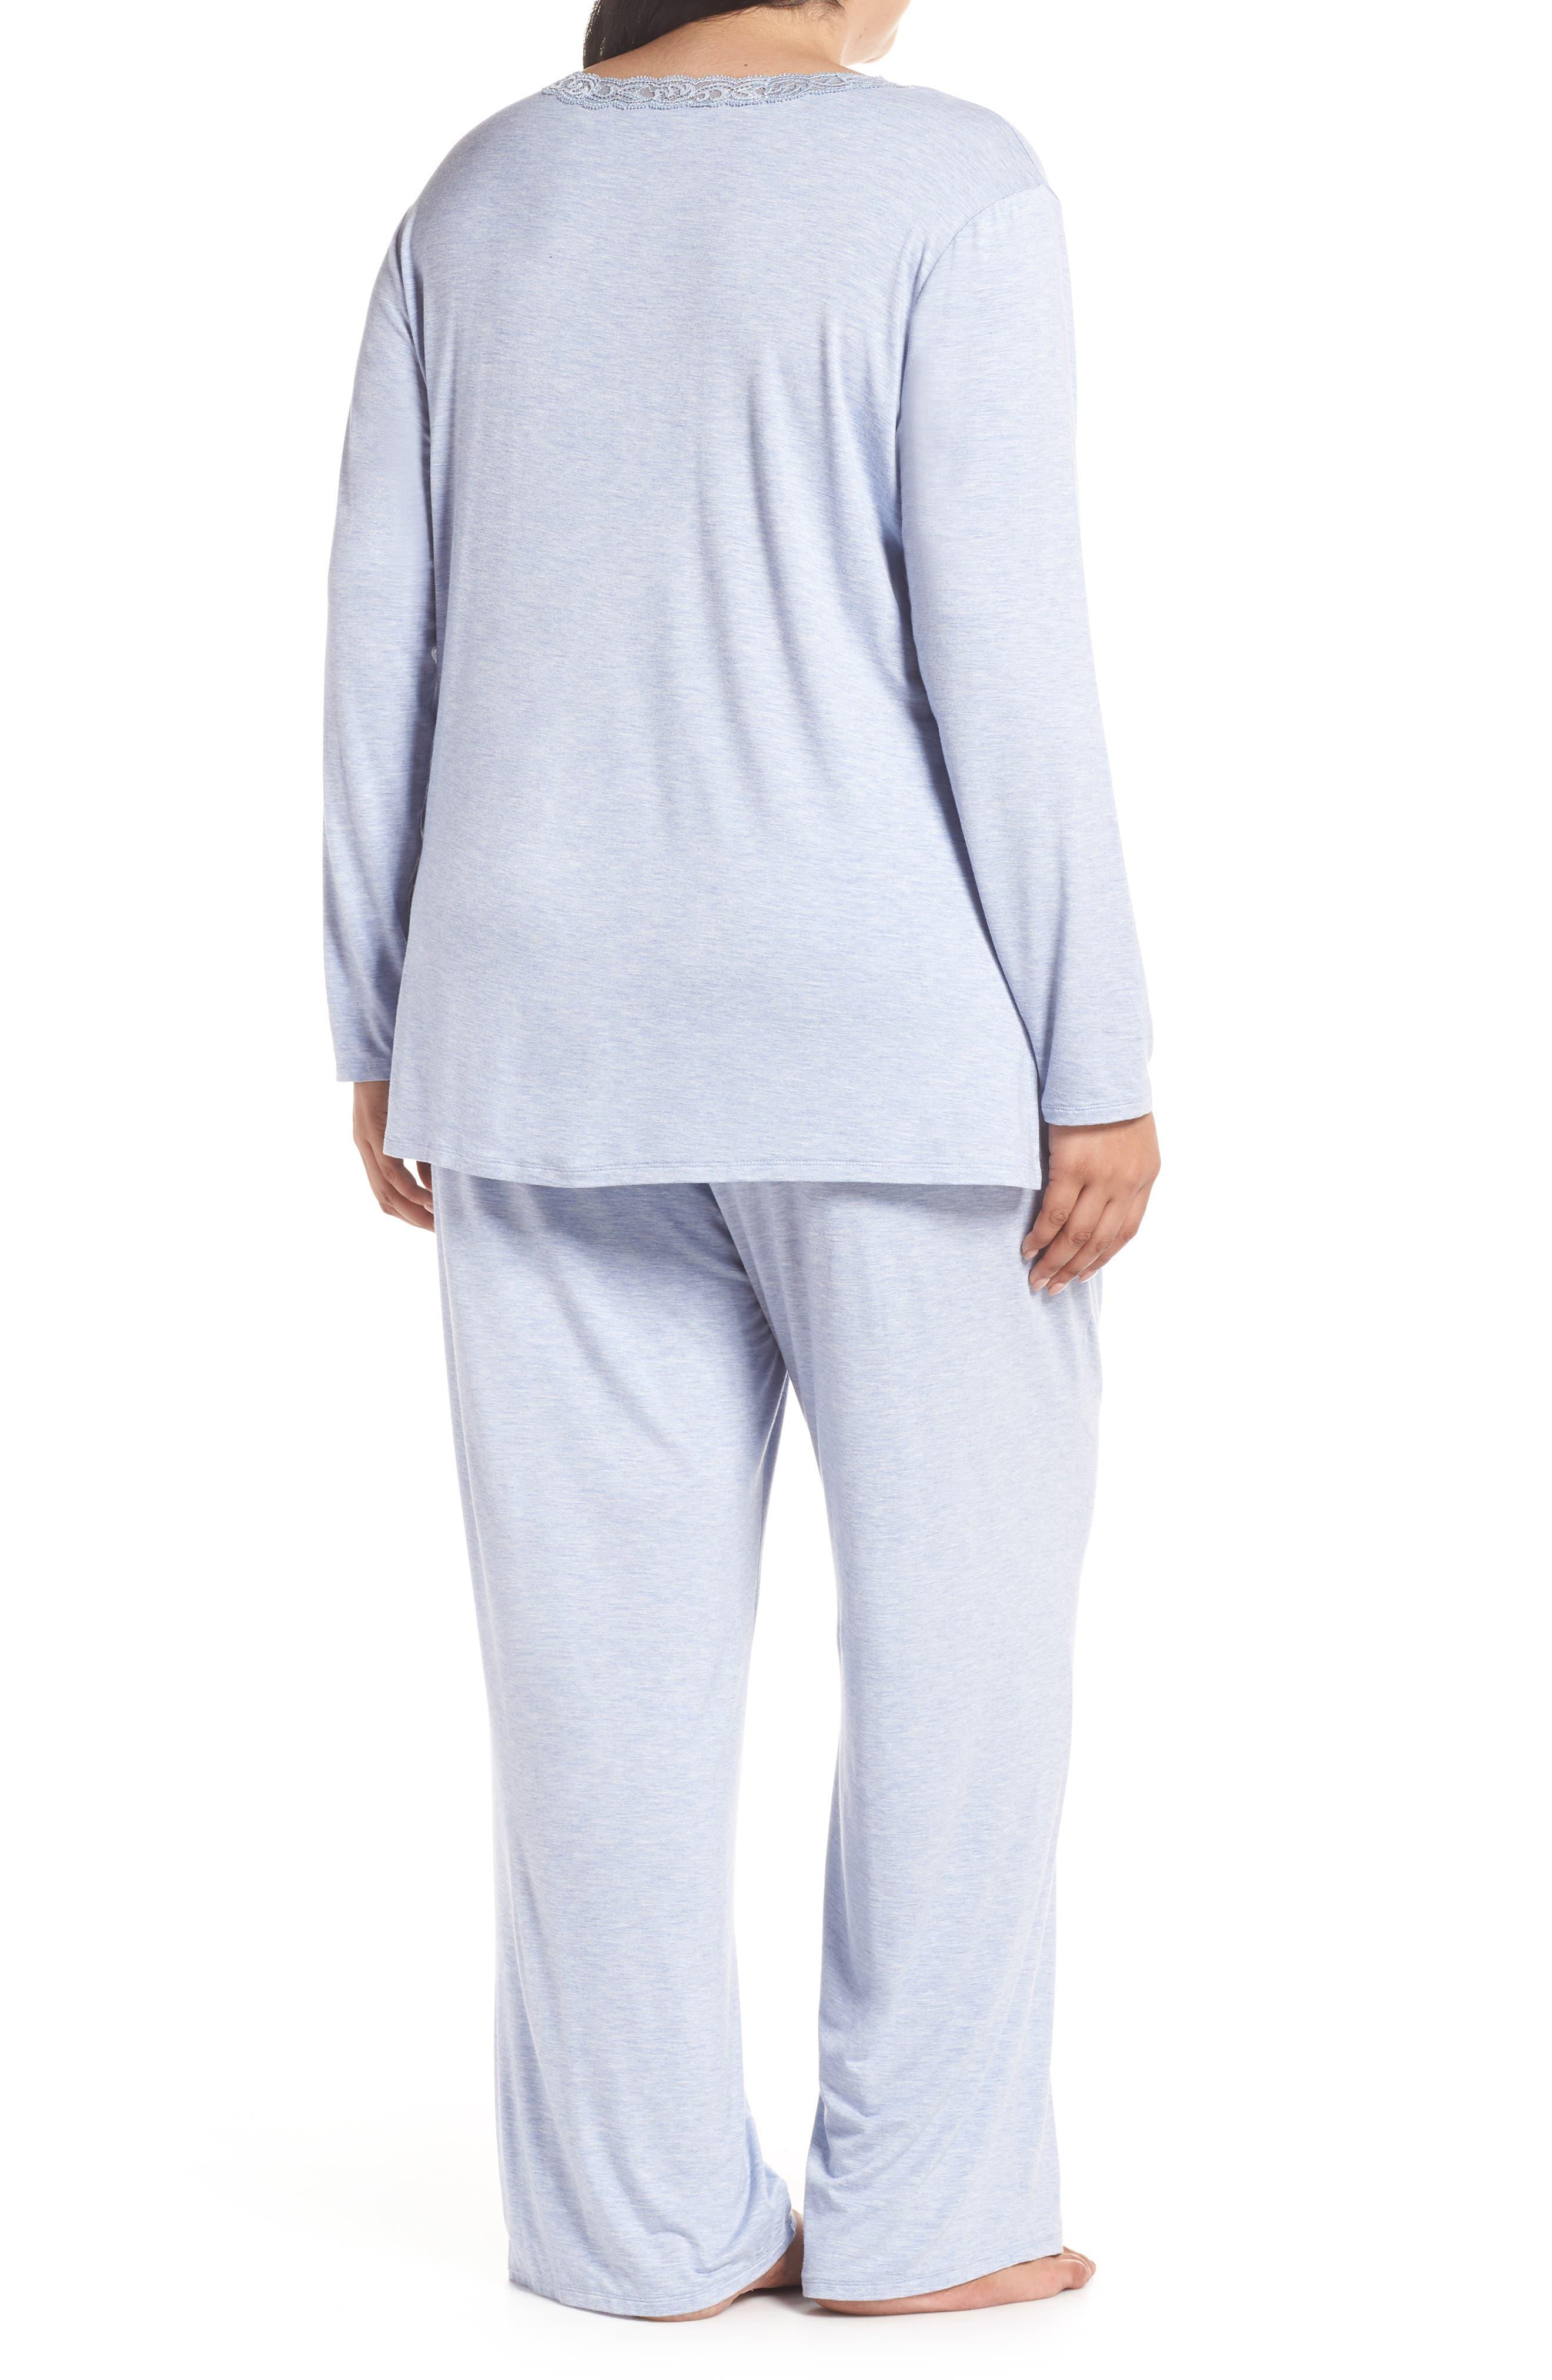 NATORI, Feathers Pajamas, Alternate thumbnail 2, color, 470